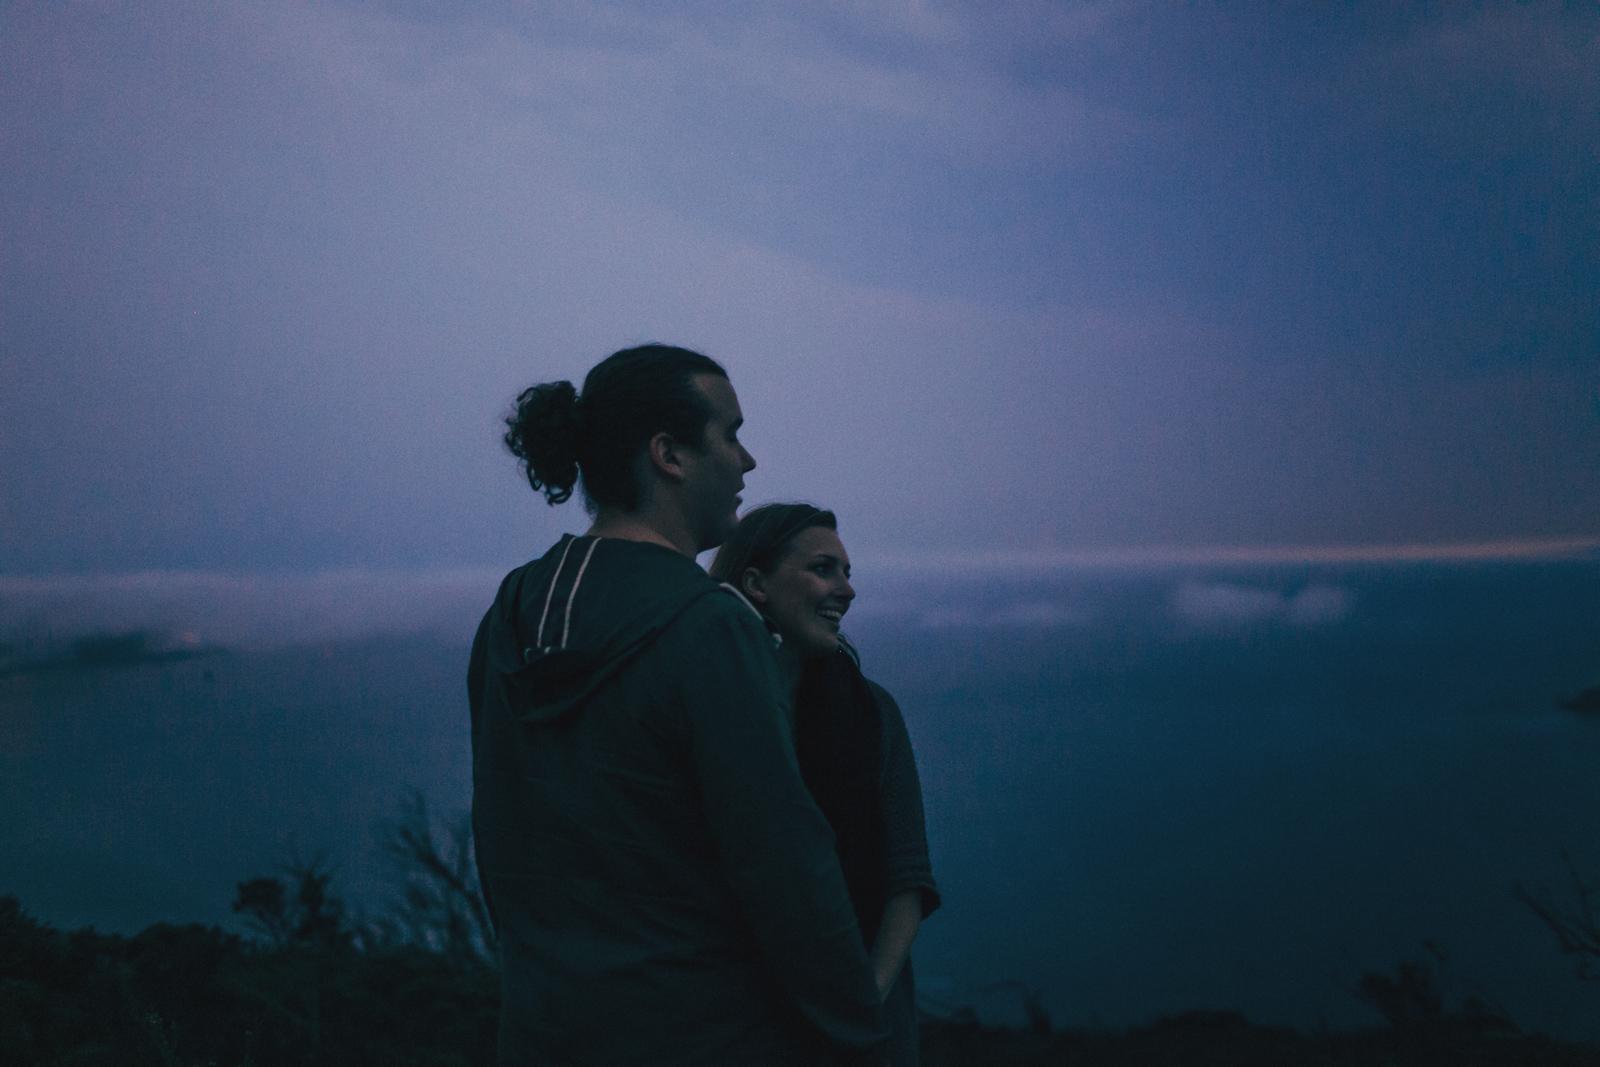 Isaiah-&-Andrea-Portraits---0180